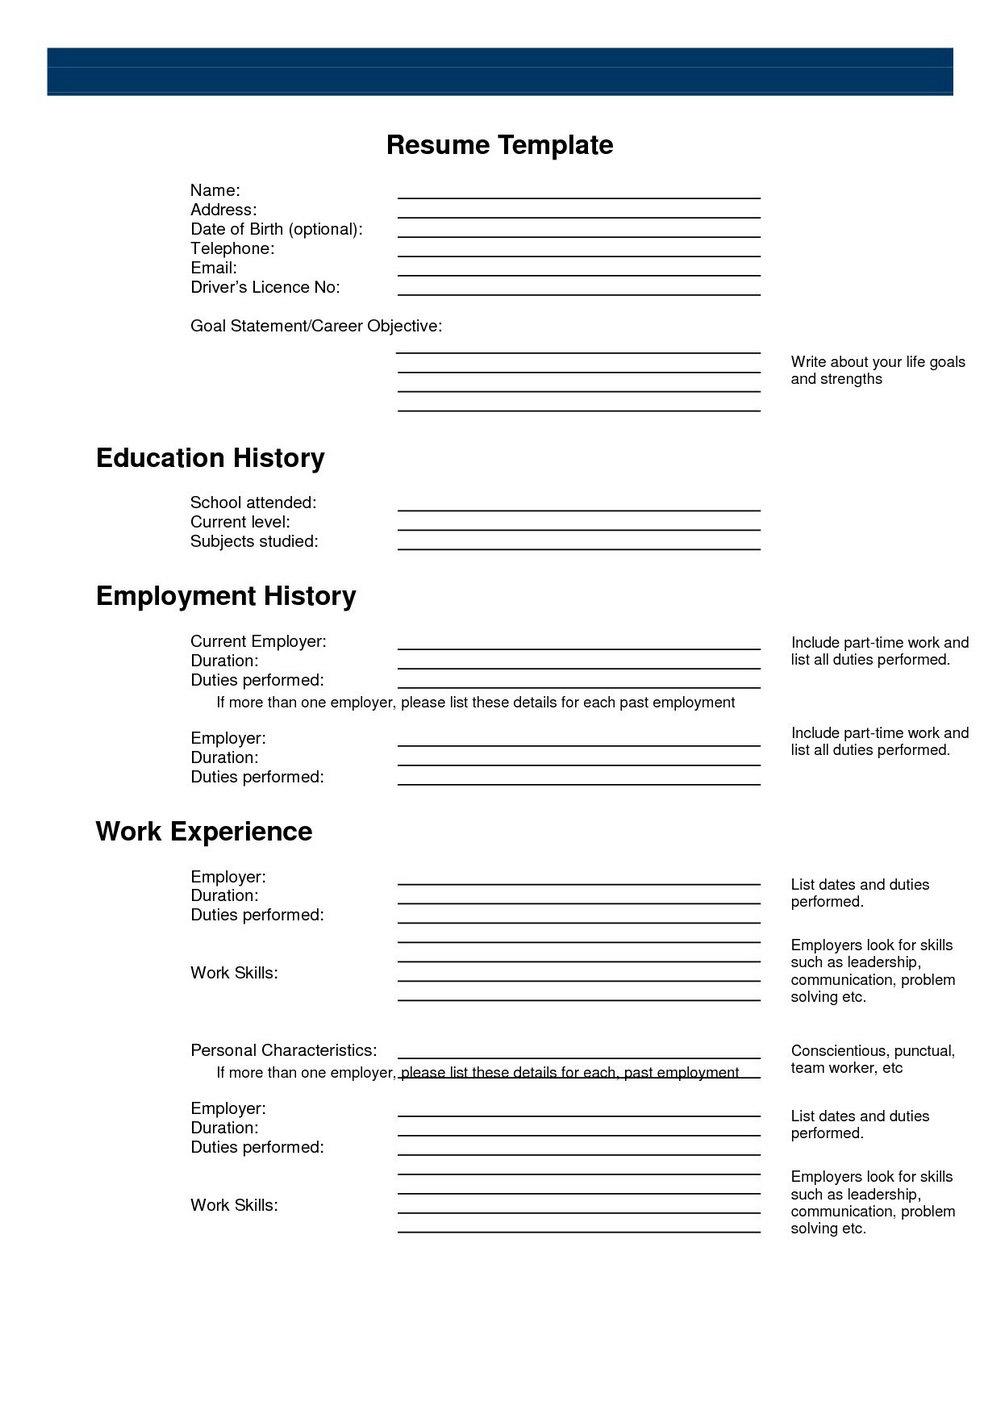 Resume Builder Software Download Free